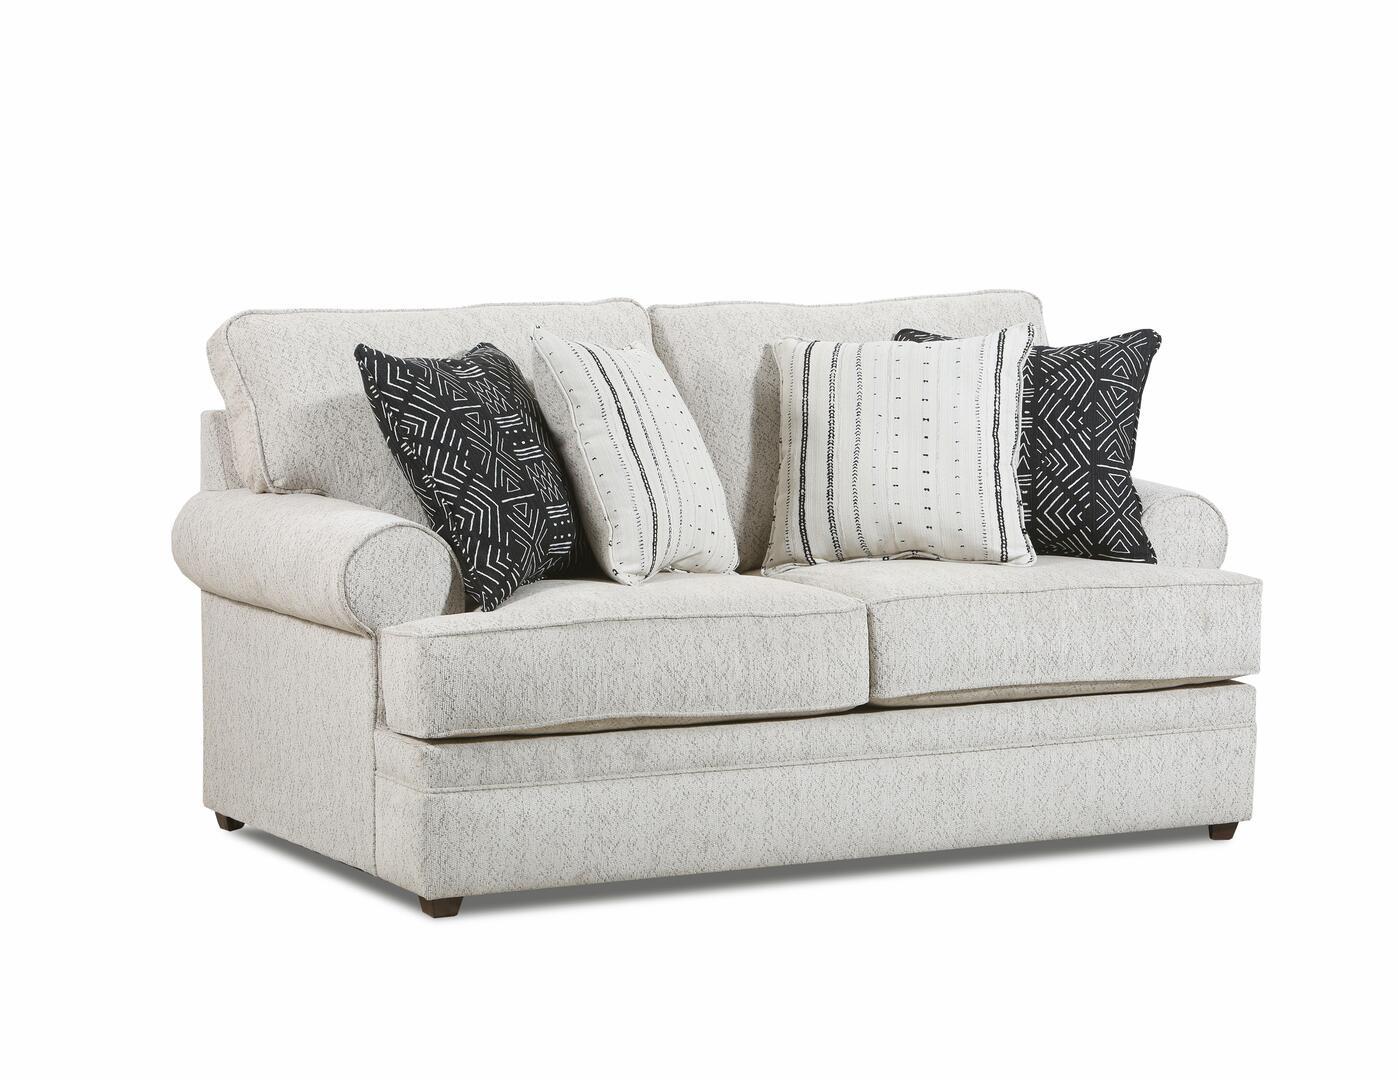 Lane Furniture Gibson Collection 8041